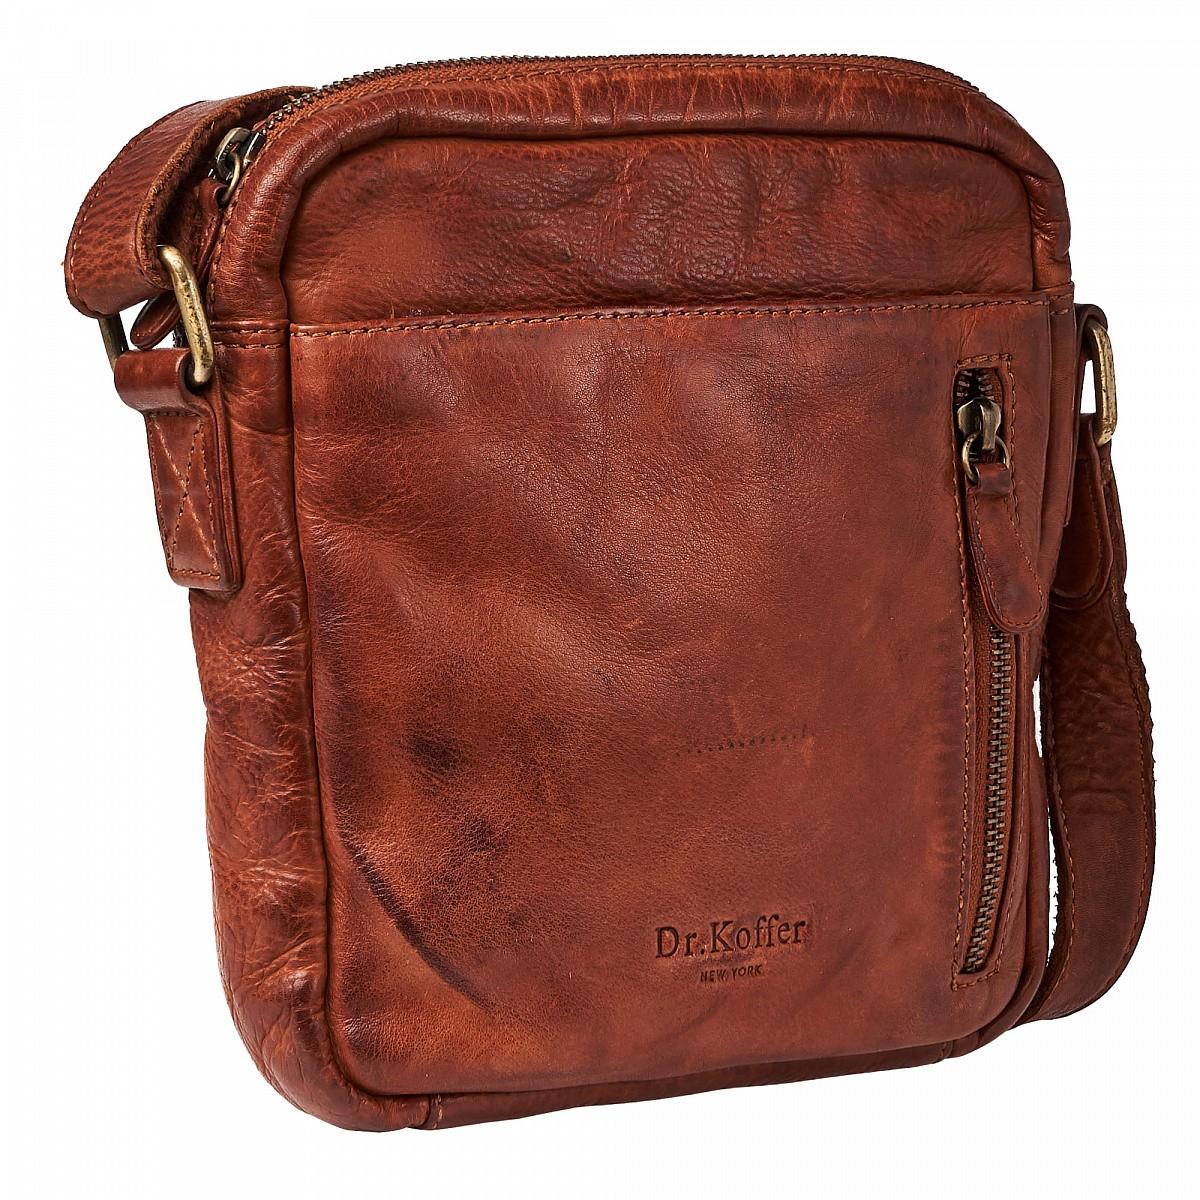 Др. Коффер M402722-248-05 сумка через плечо